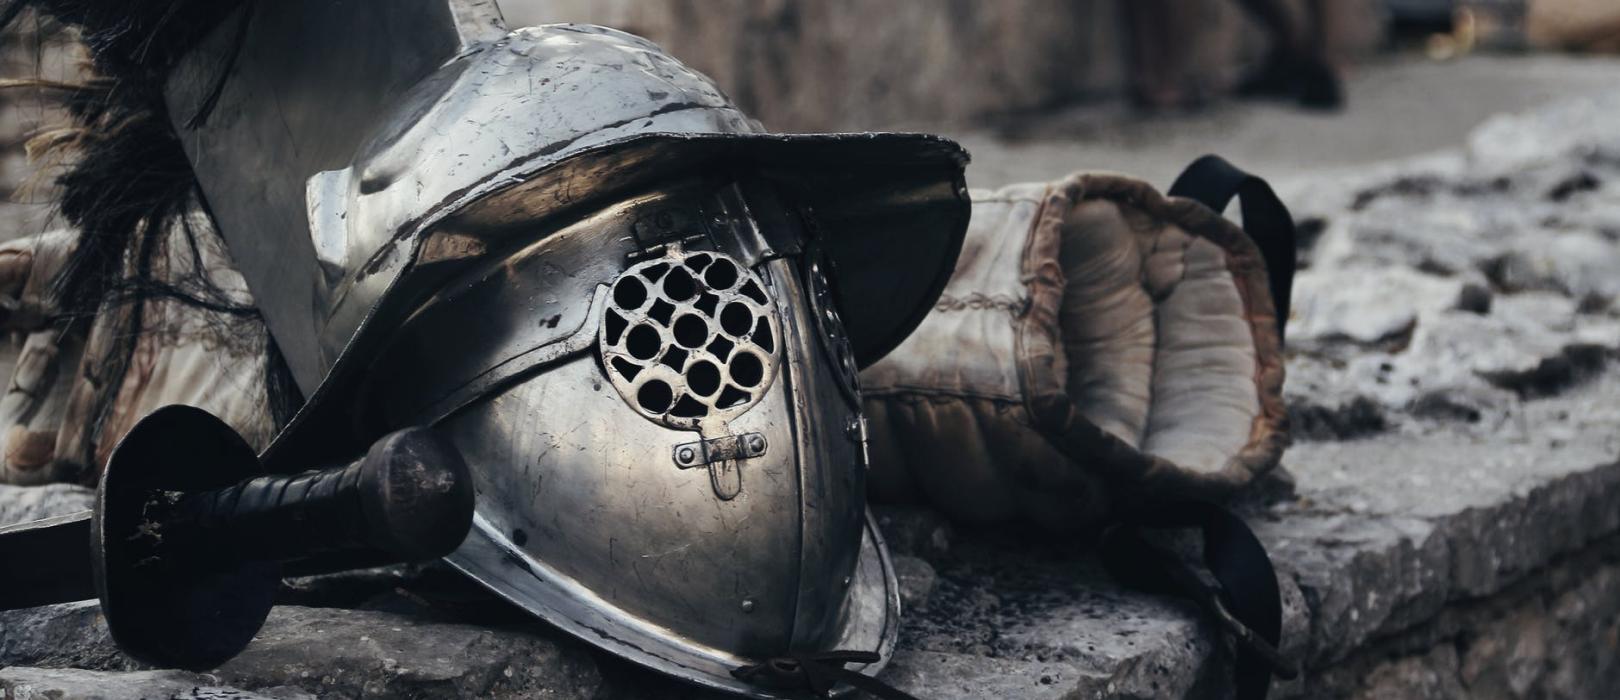 Rectangle 3.1 1 - World of armor design